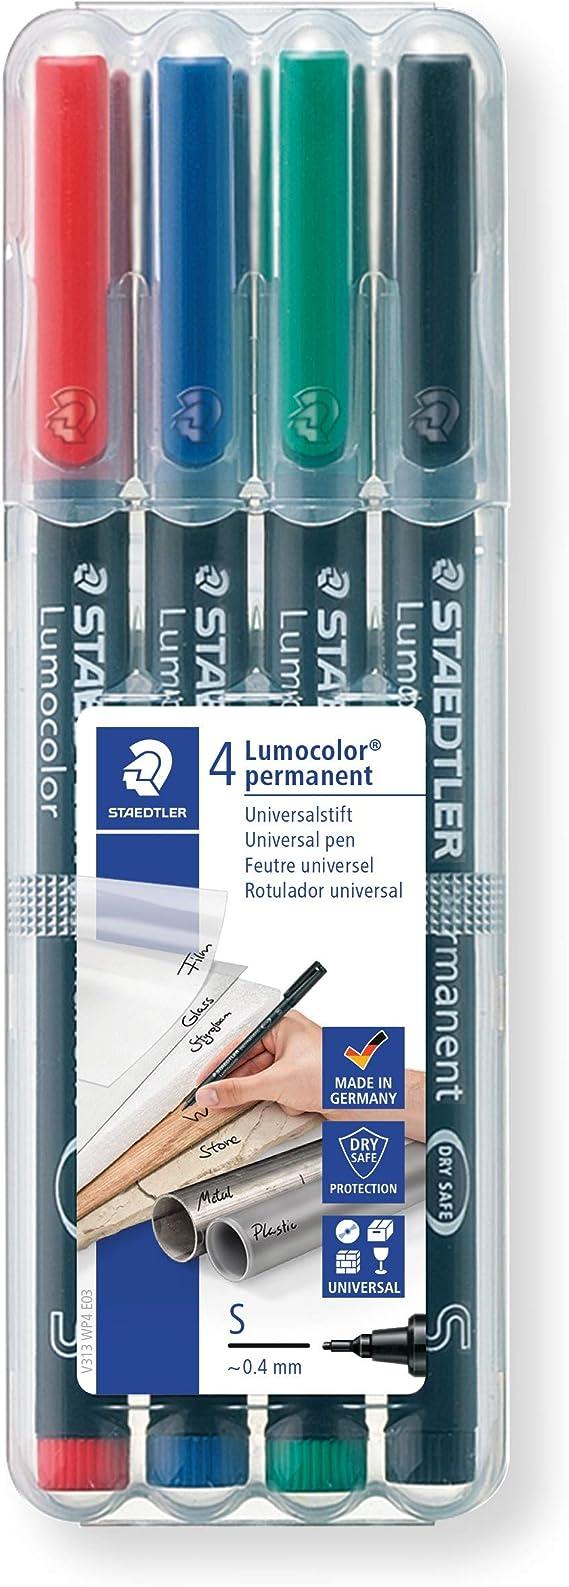 greeting card paint pen Germany STAEDTLER metal color marker invitation sign in pen sku: yb112 ON SALE bujo marker